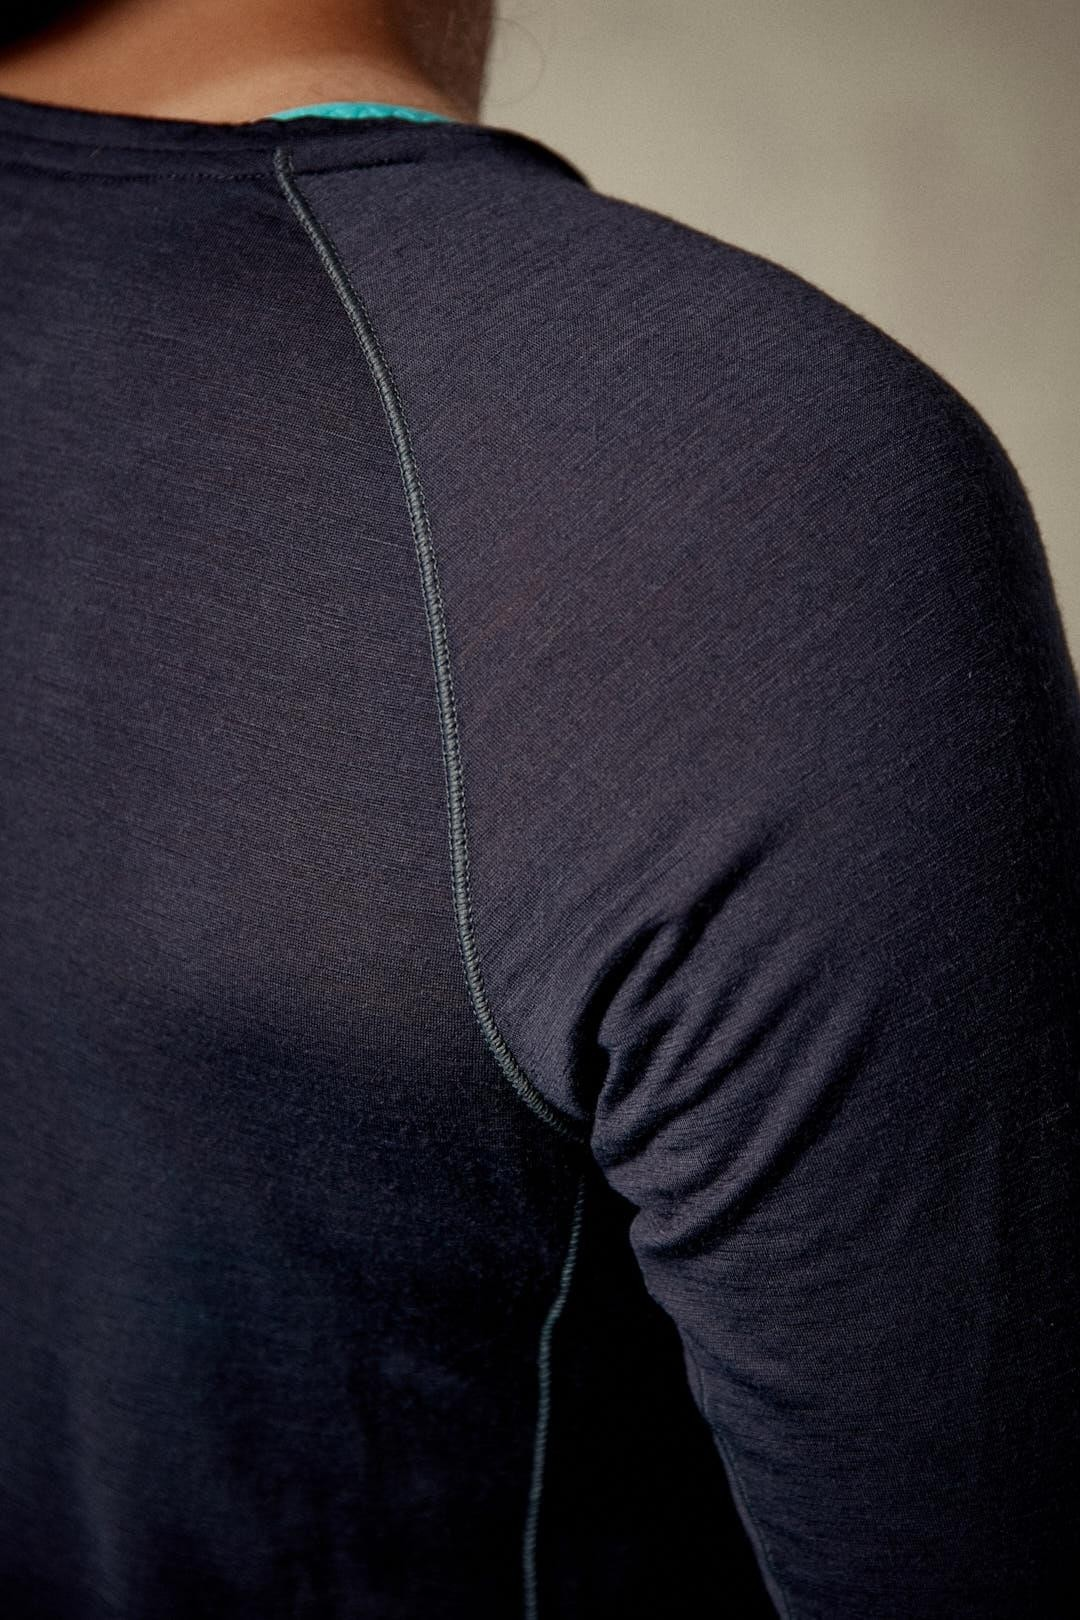 Rab Women's Merino 120 Long Sleeve Tee - Ebony